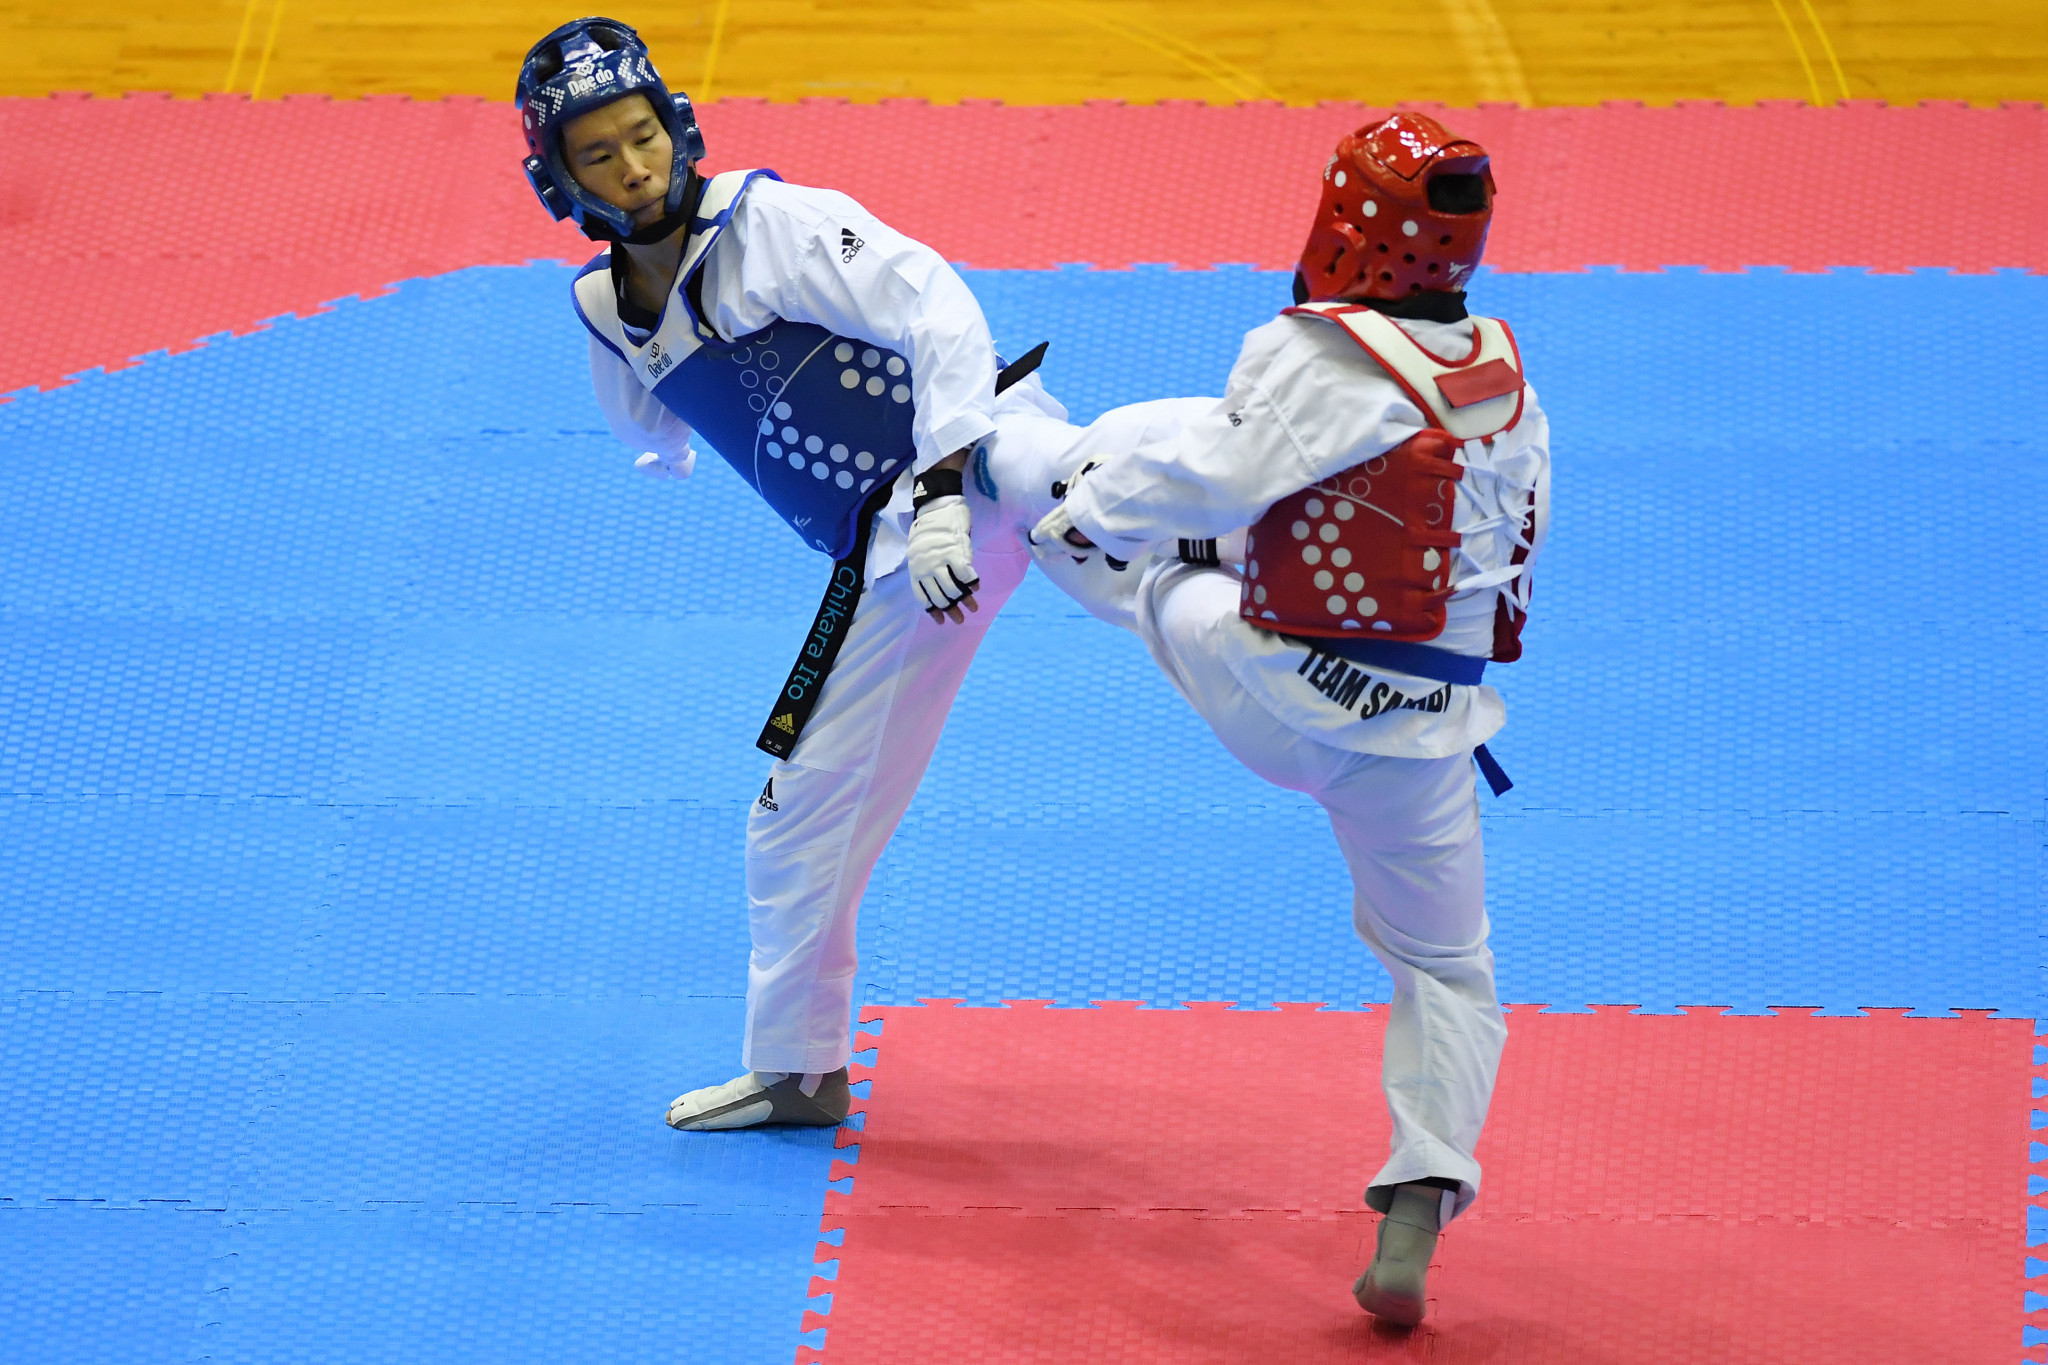 Para-taekwondo will debut at the Tokyo 2020 Paralympic Games ©Getty Images